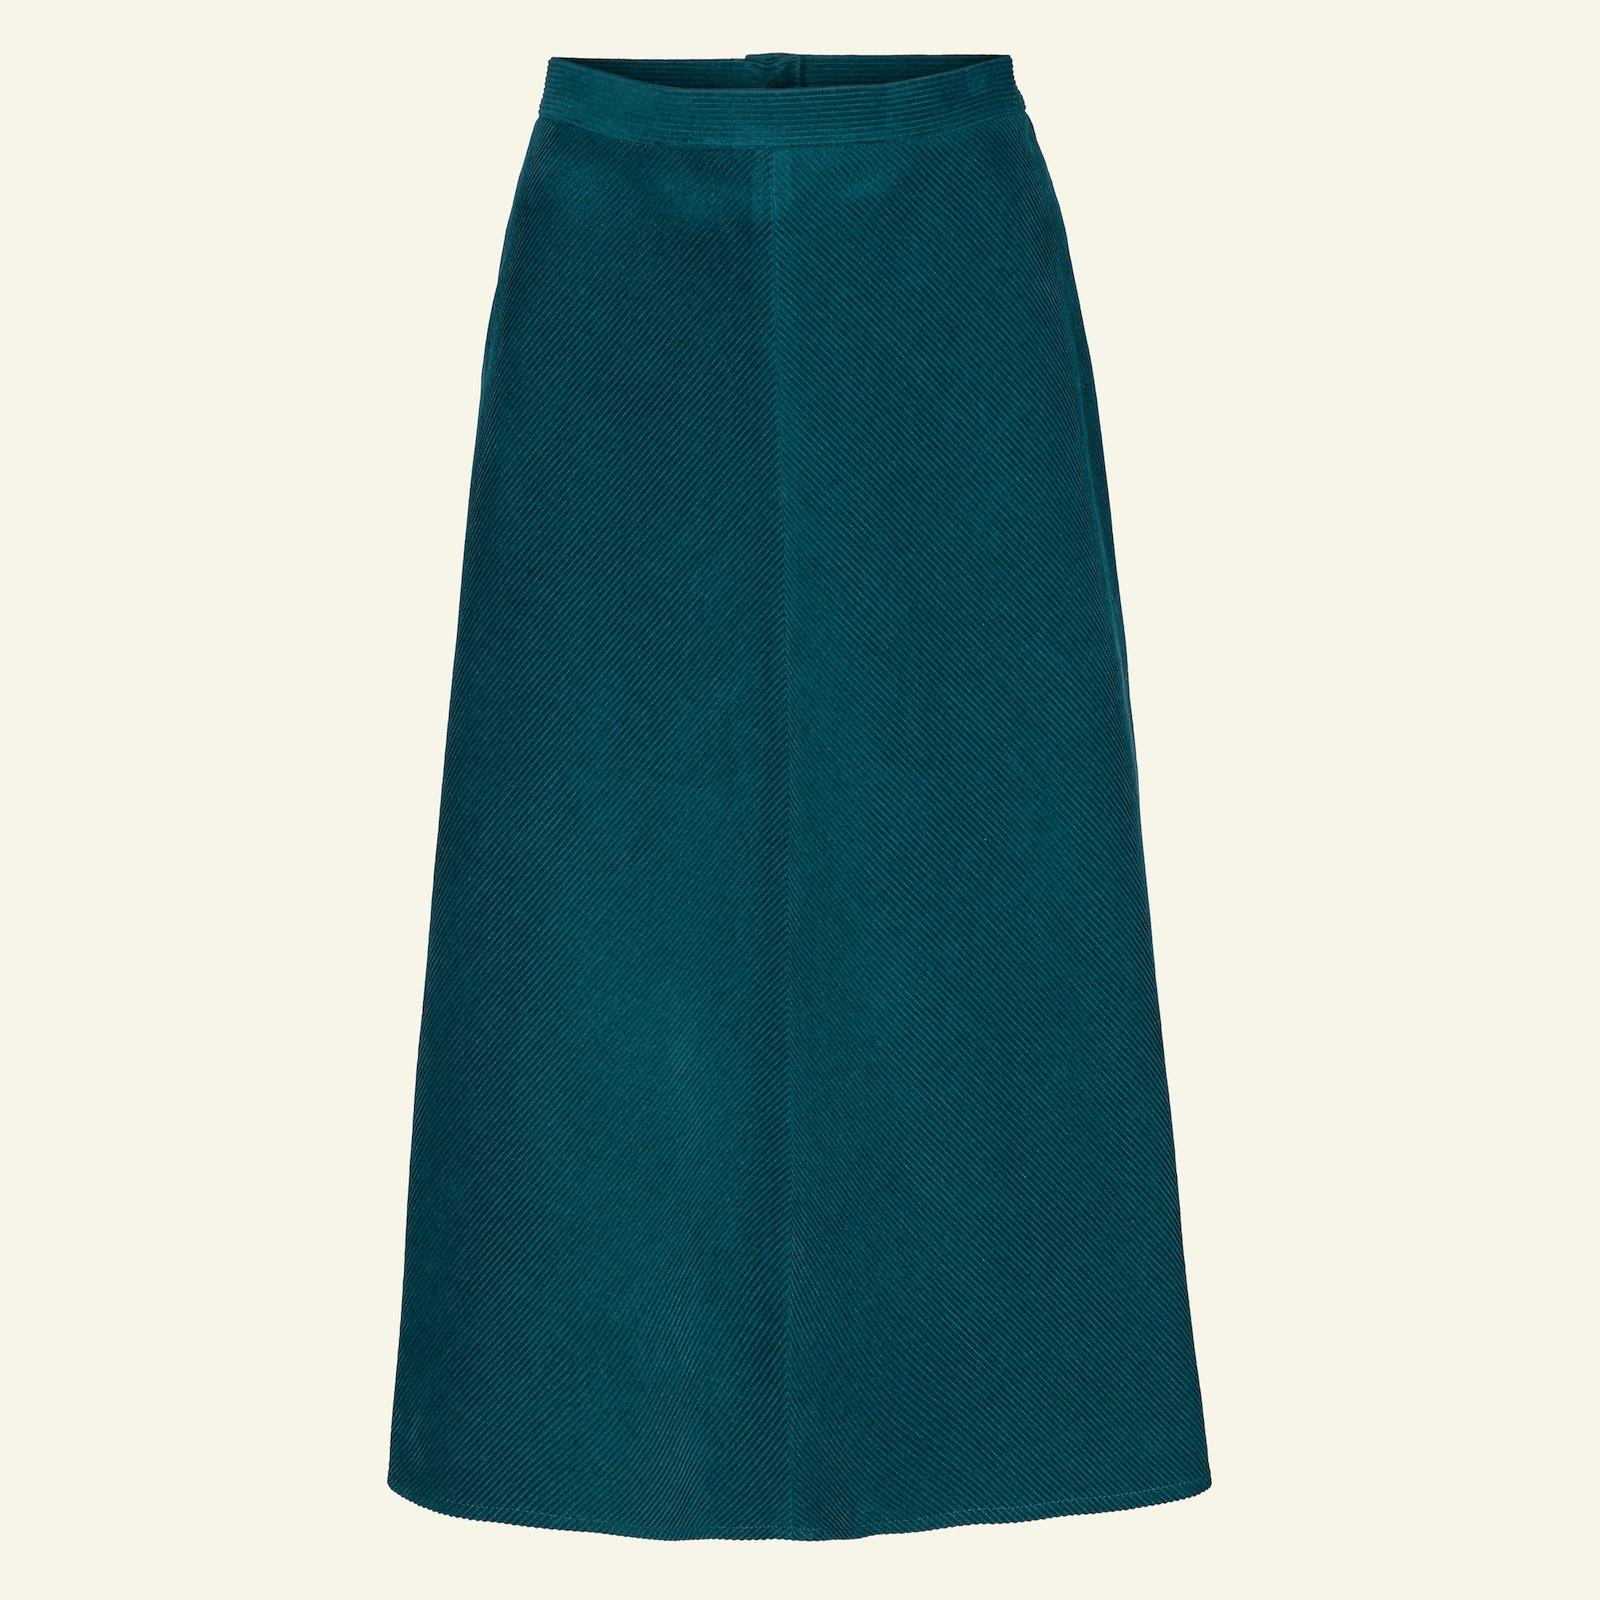 Skirt with A-shape, 38/10 p21038_430812_sskit